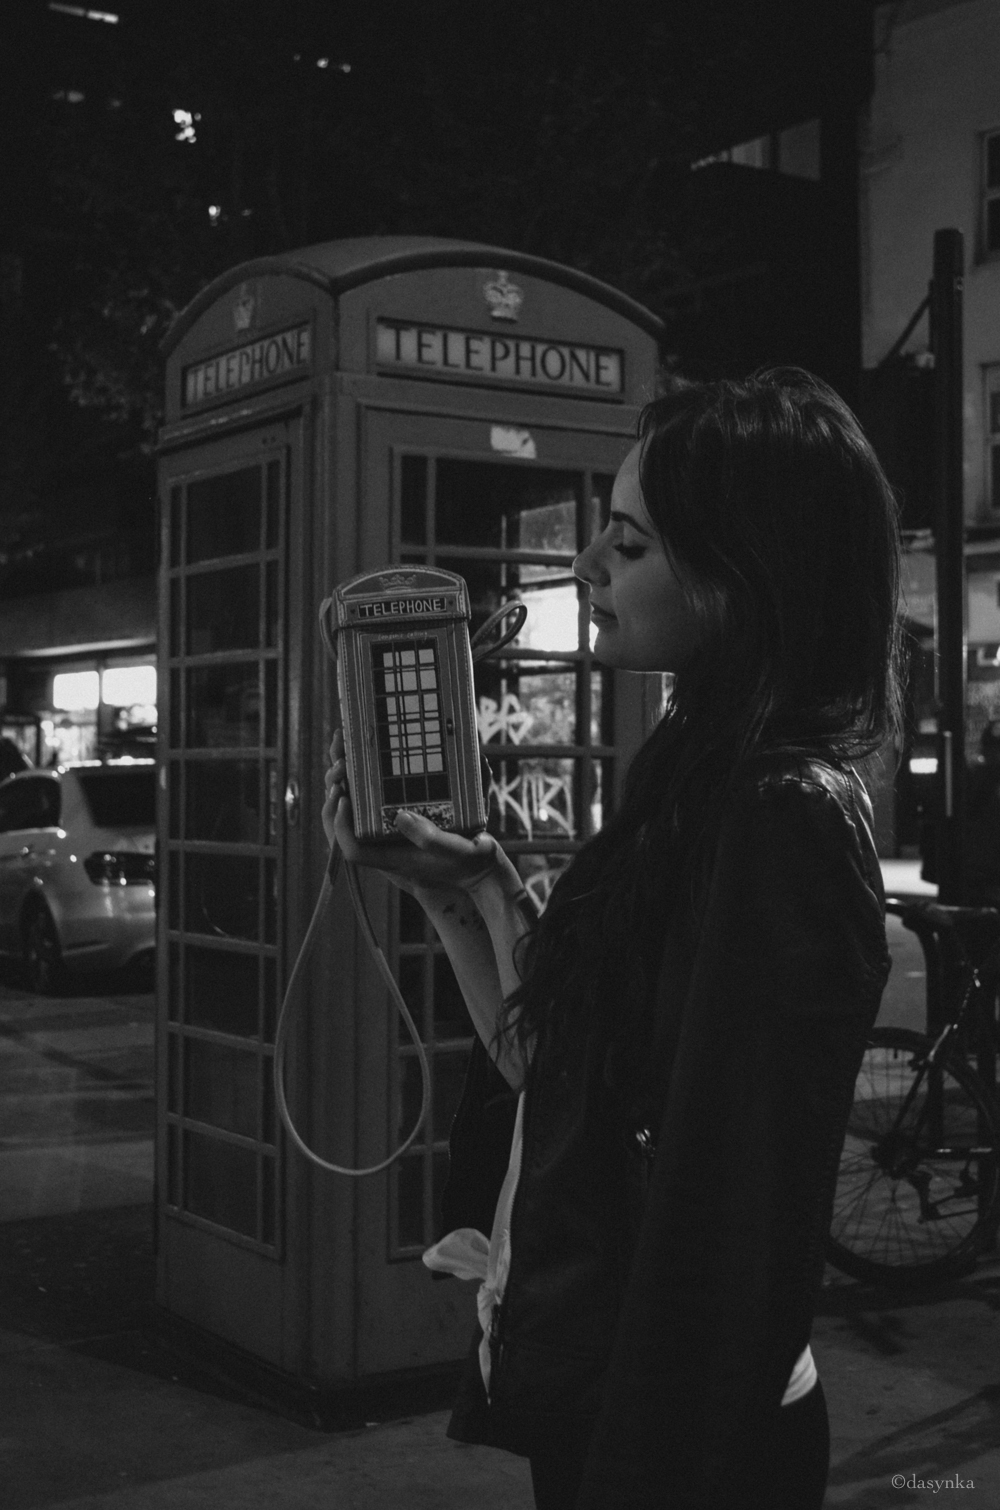 dasynka-fashion-blogger-london-life-street-style-big-ben-pinterest-red-phonebox-bag